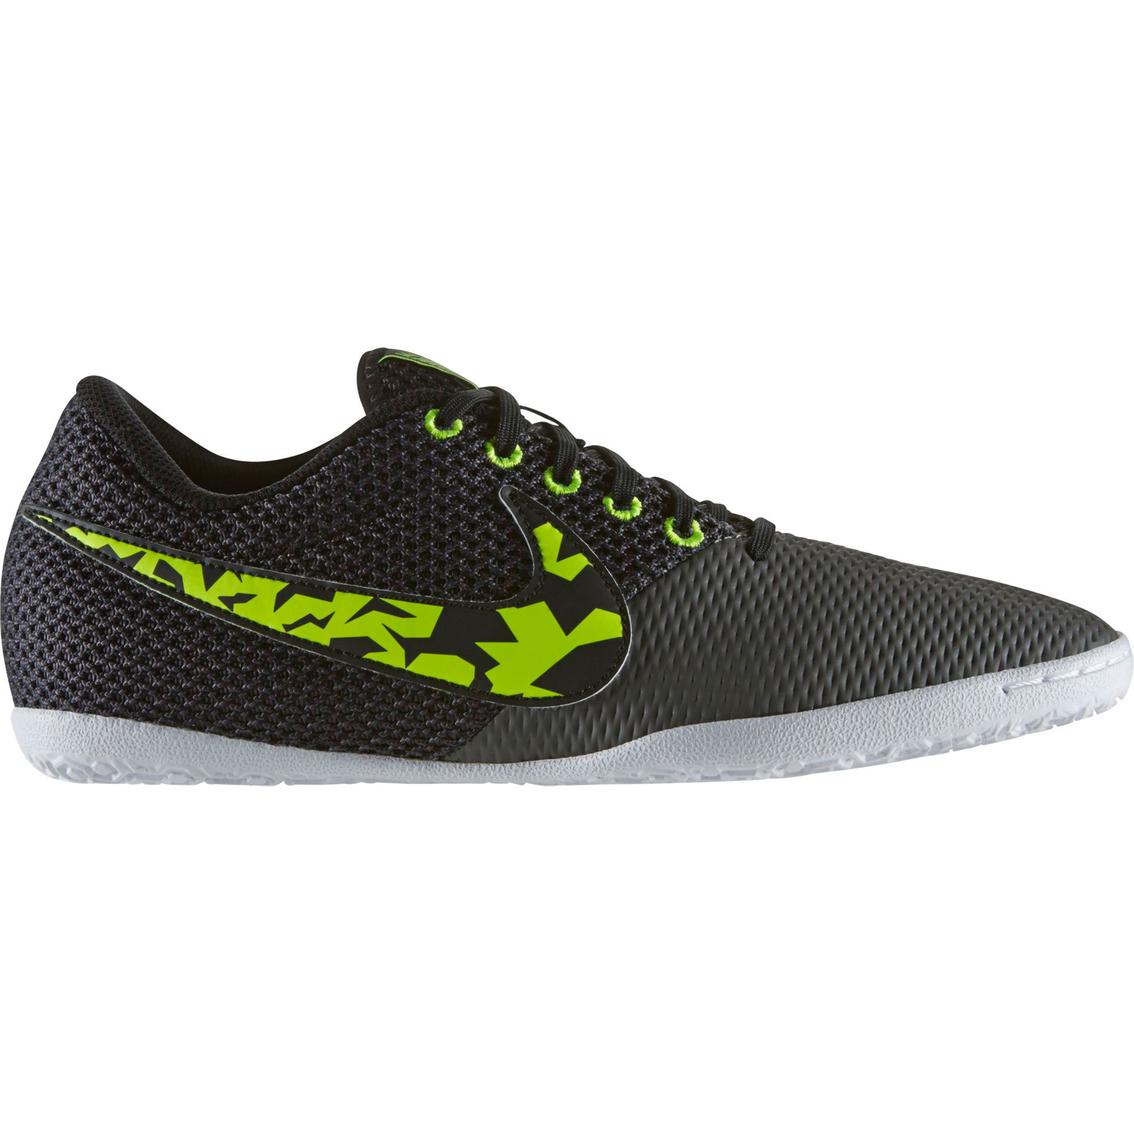 cdd139c4b Nike Men s Elastico Pro Iii Indoor Soccer Shoes